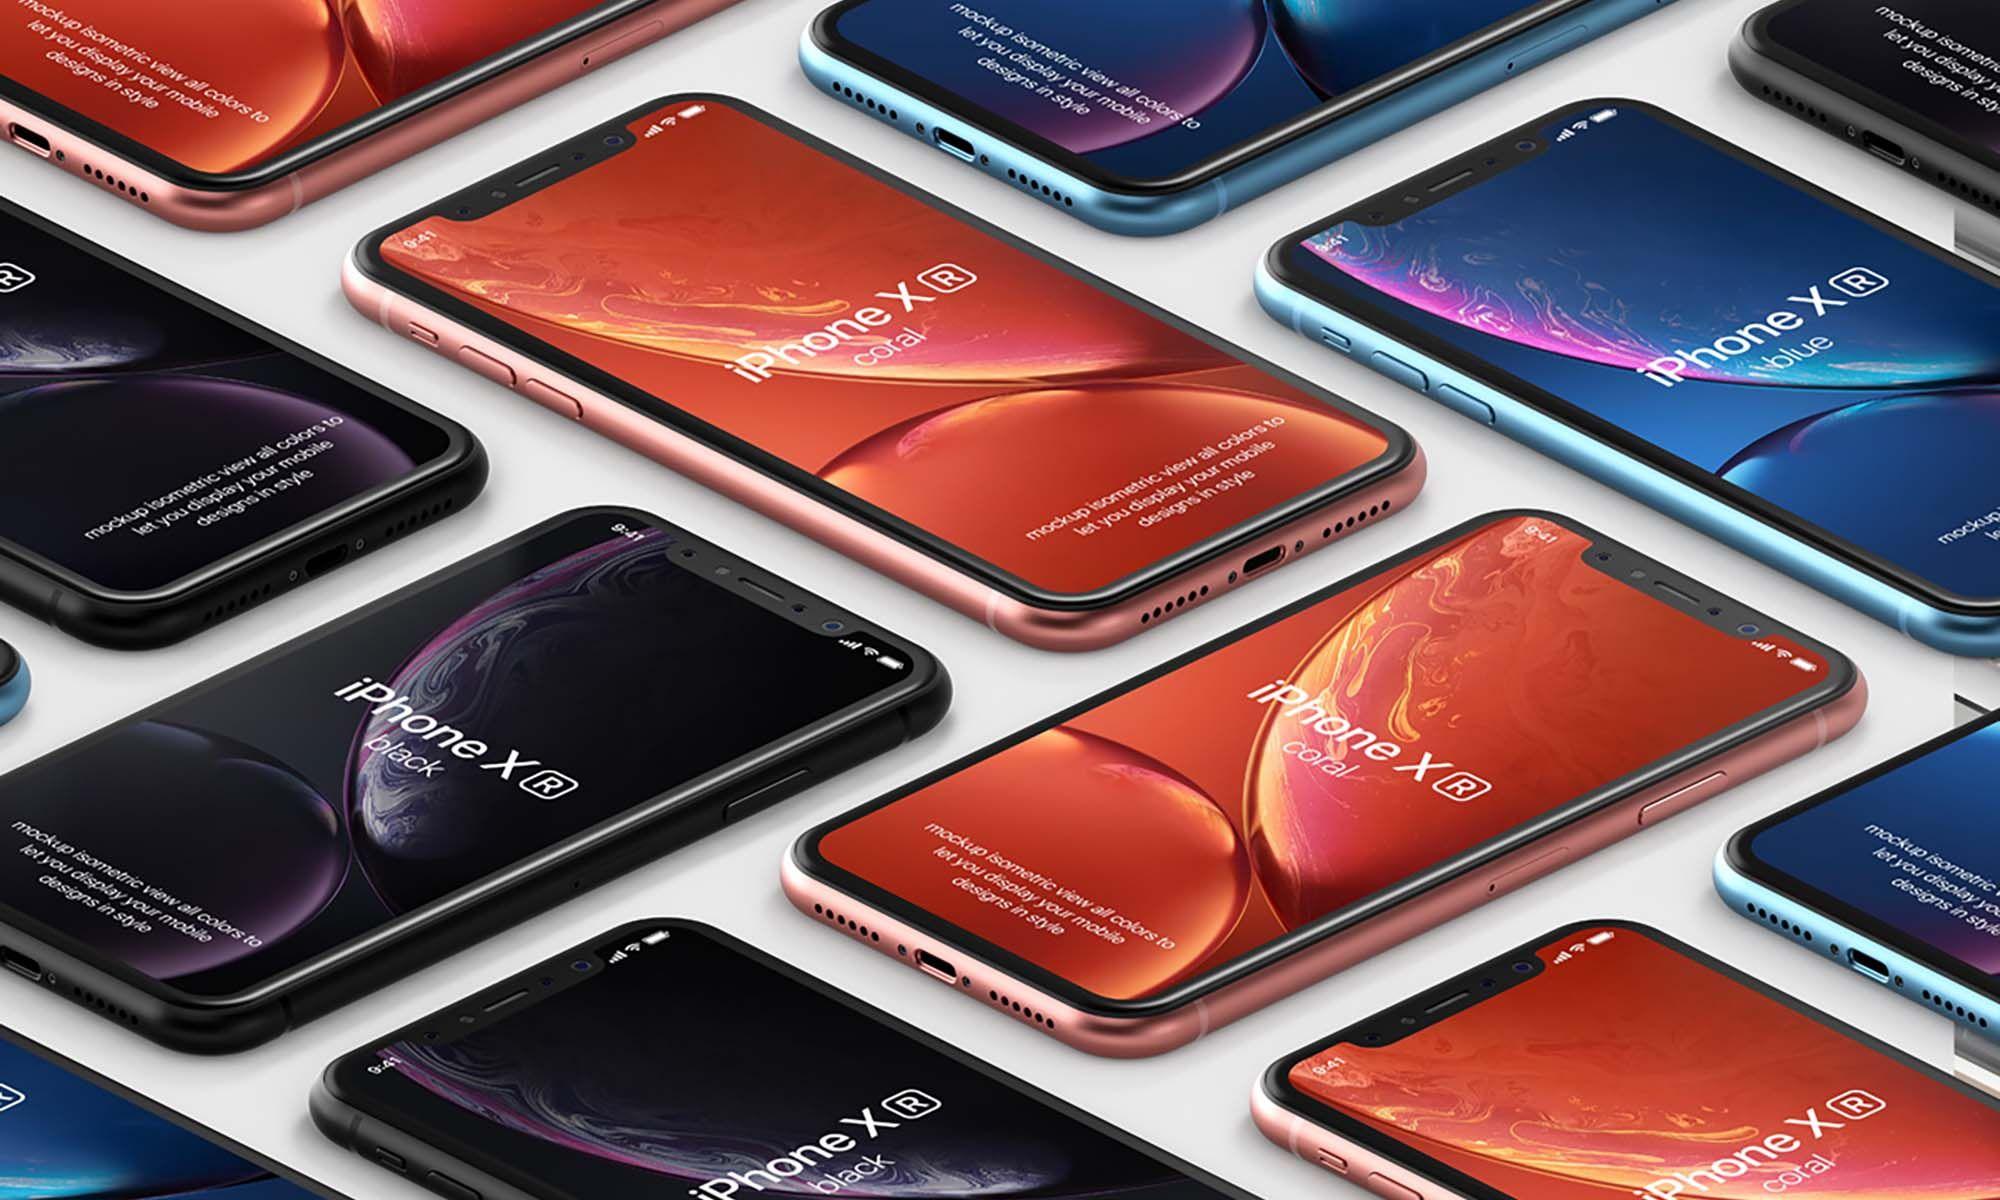 10 Best Free Isometric Mockups Unblast Iphone Mockup Psd Mockup Free Psd Free Iphone